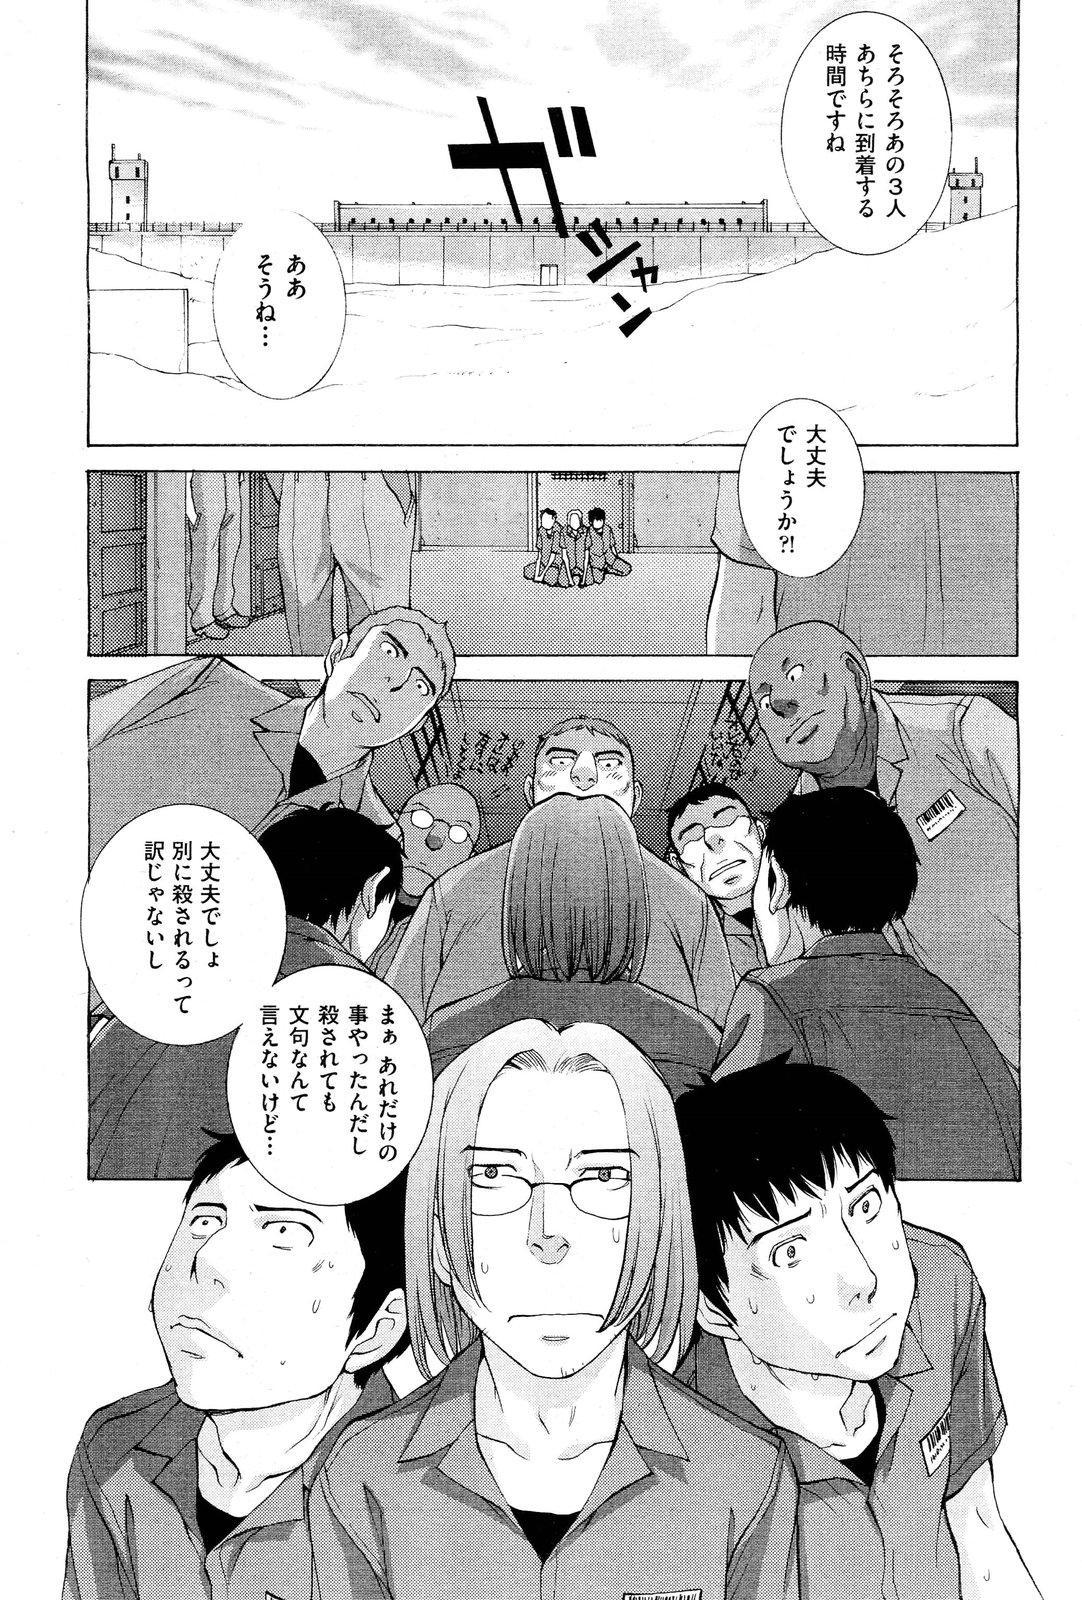 Hanazono 151